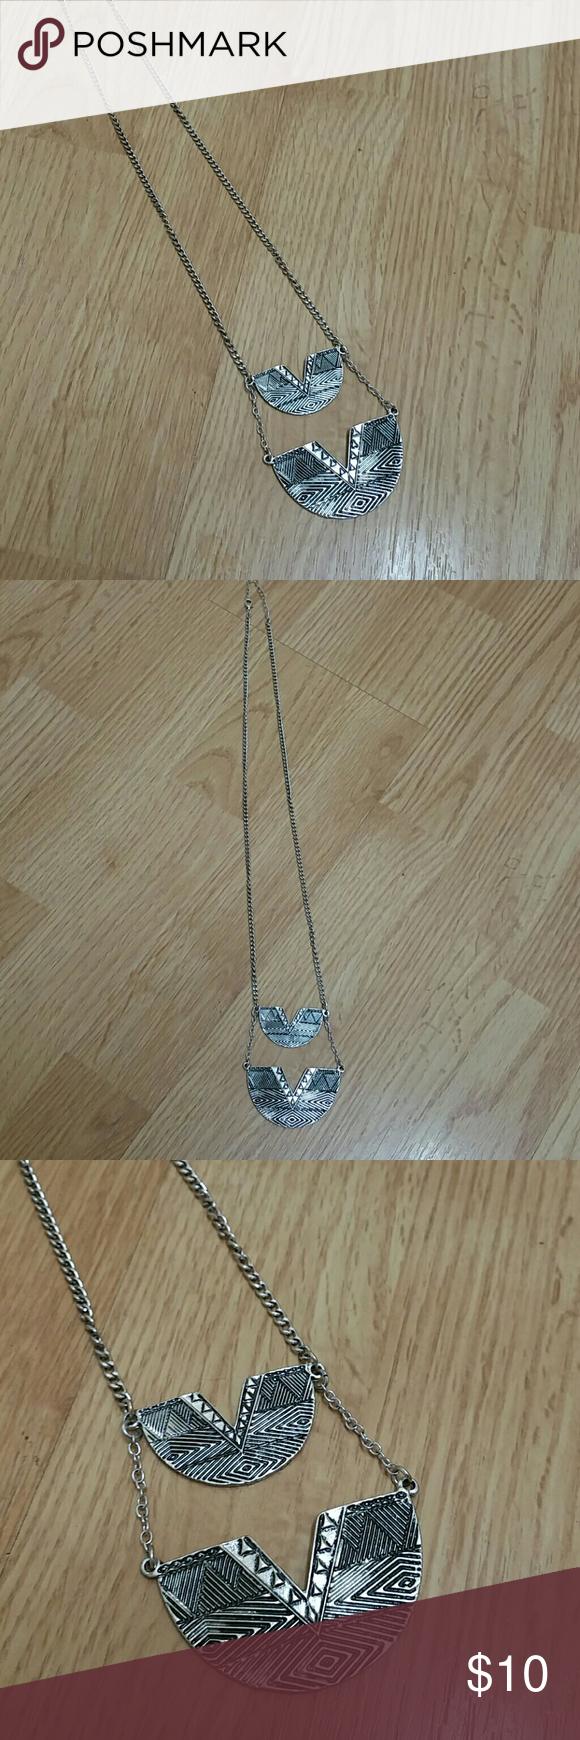 Stone u locket tribal etched necklace